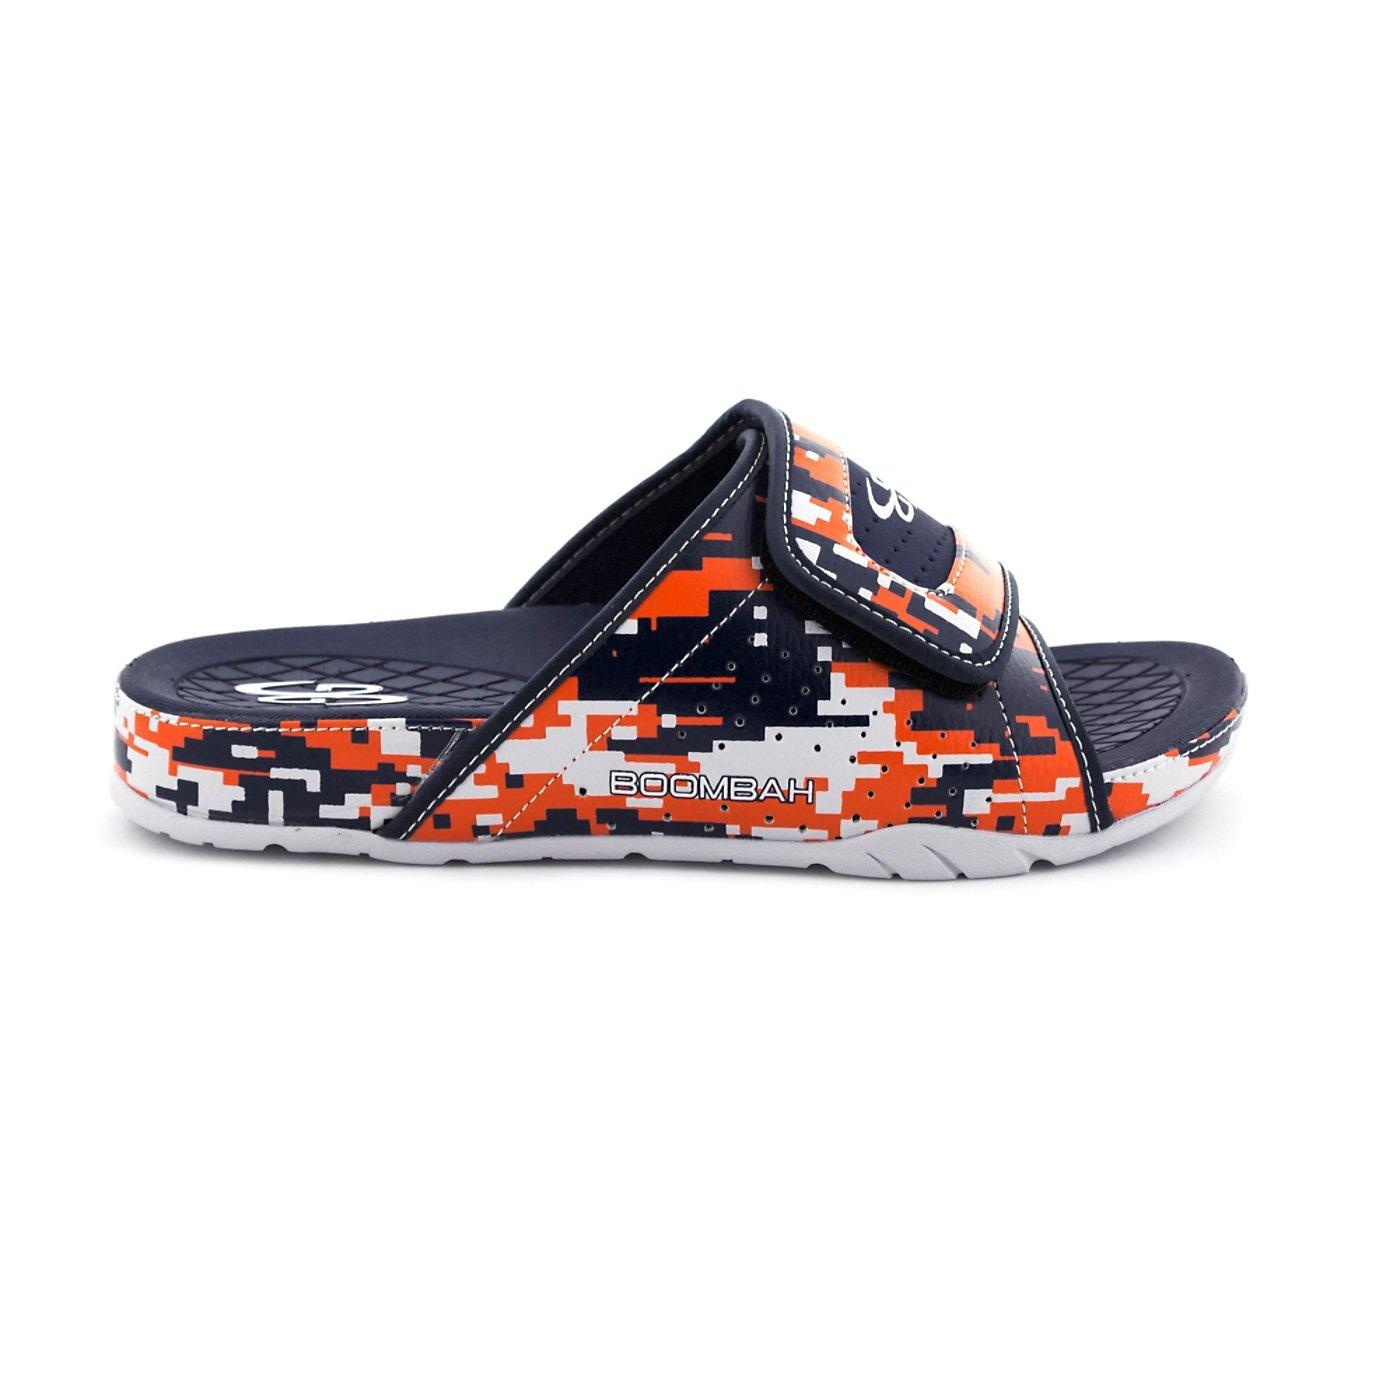 Boombah Men's Tyrant Digital Camo Slide Sandals - 11 Color Options - Multiple Sizes B077NK2R4C 4|Navy/Orange